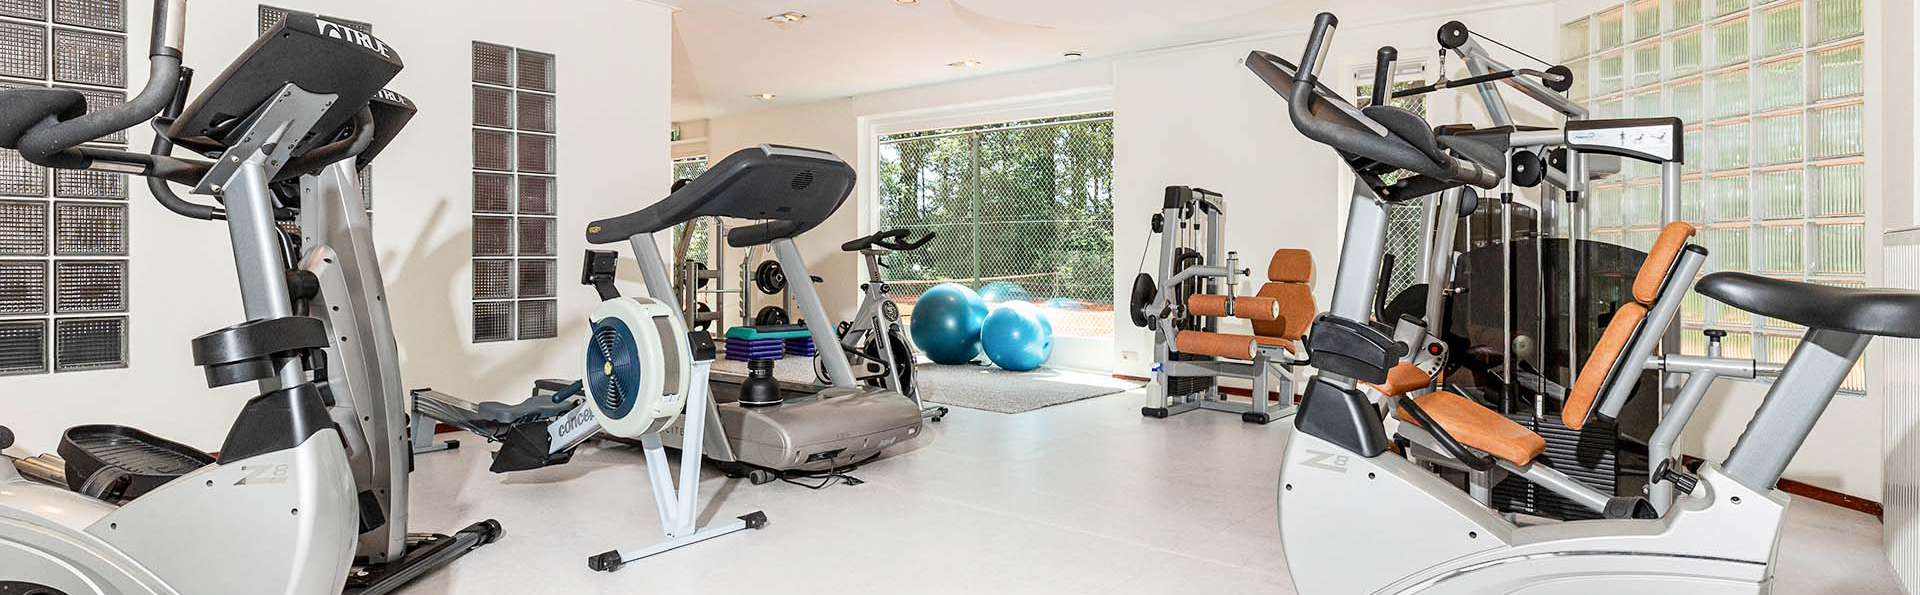 Landgoed De Rosep - EDIT_Fitness_01.jpg